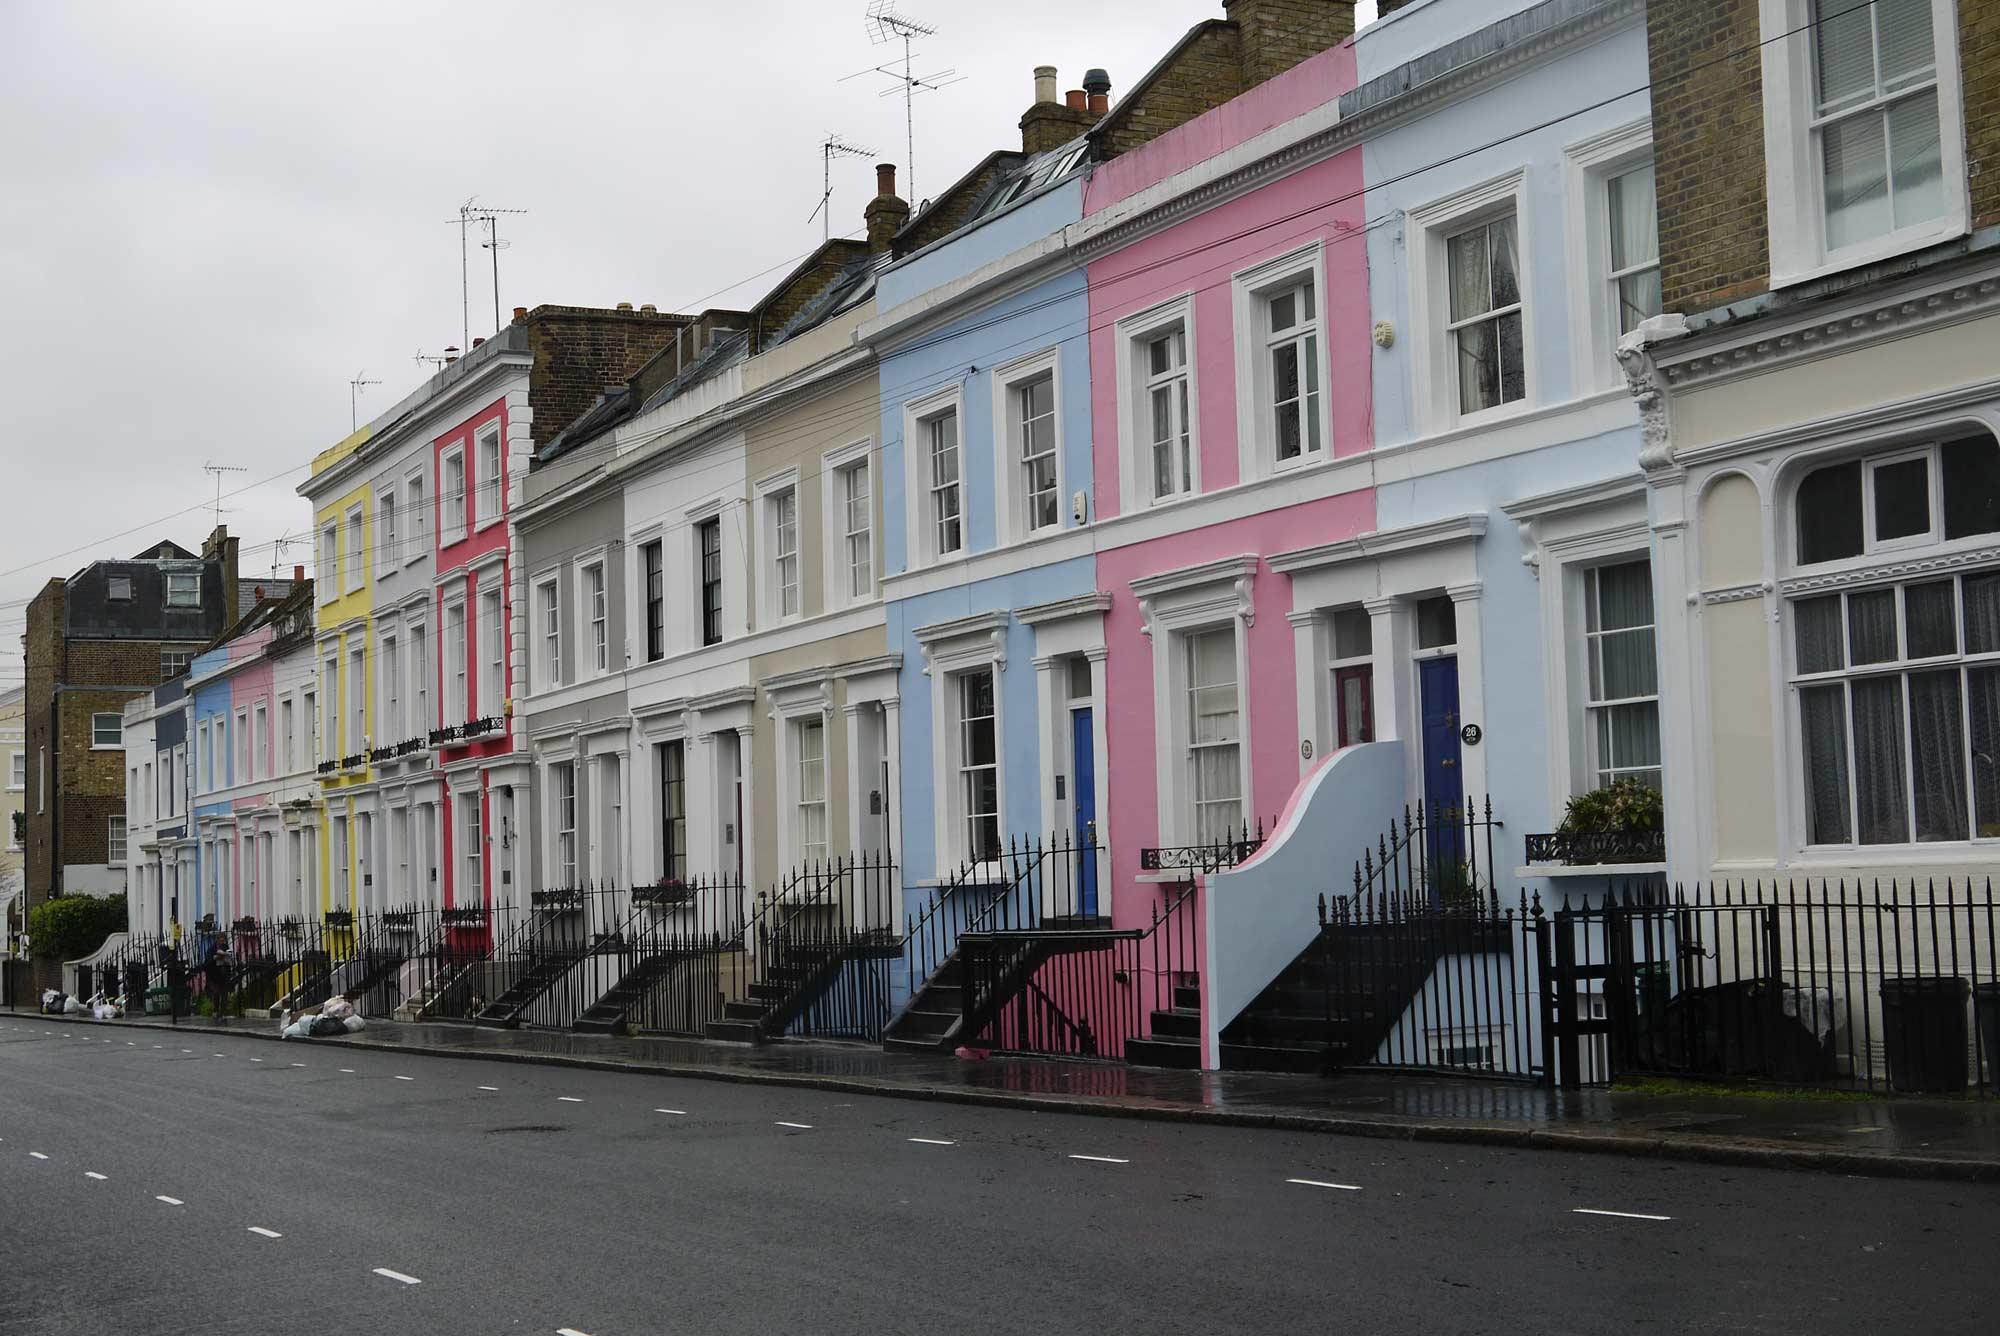 PHOTO CREDIT: SHORT LET LONDON